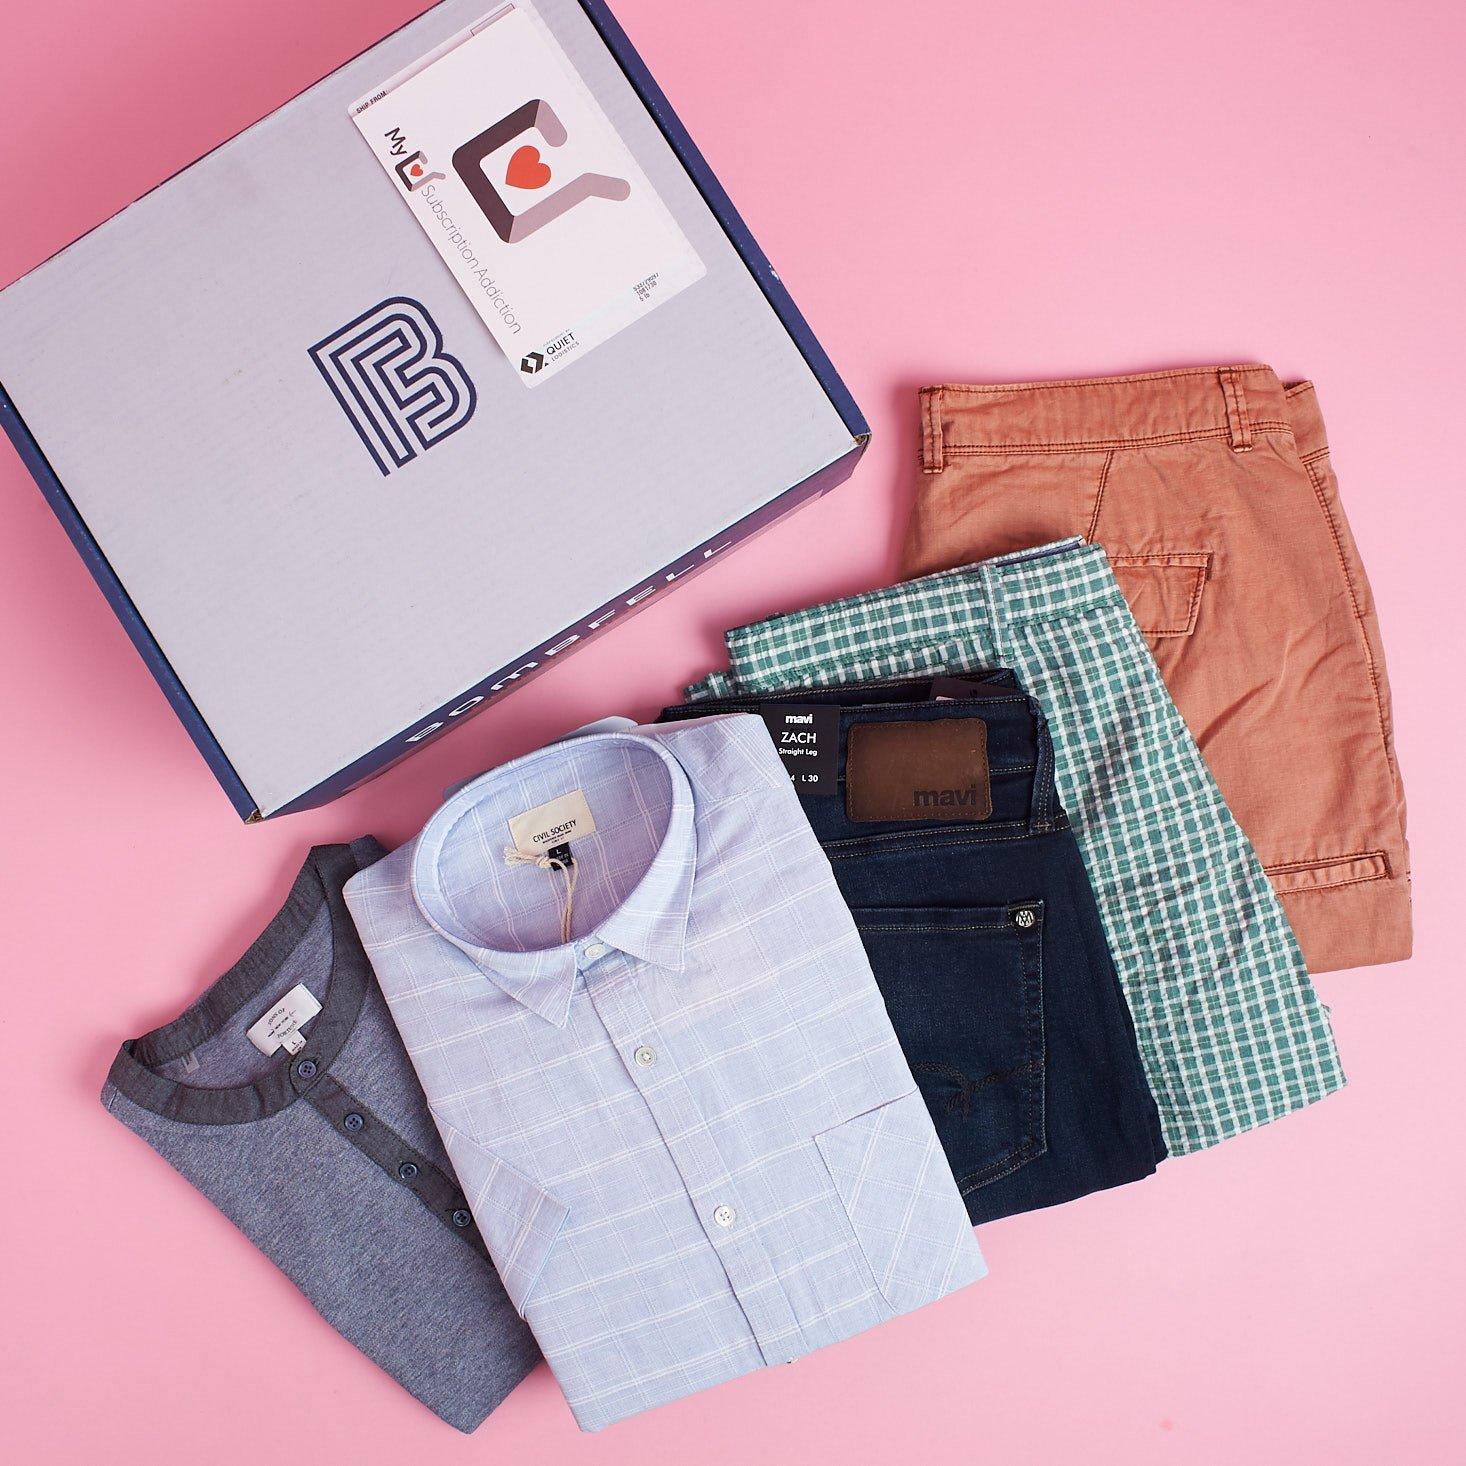 Bombfell Best Clothing Boxes for Men 2018